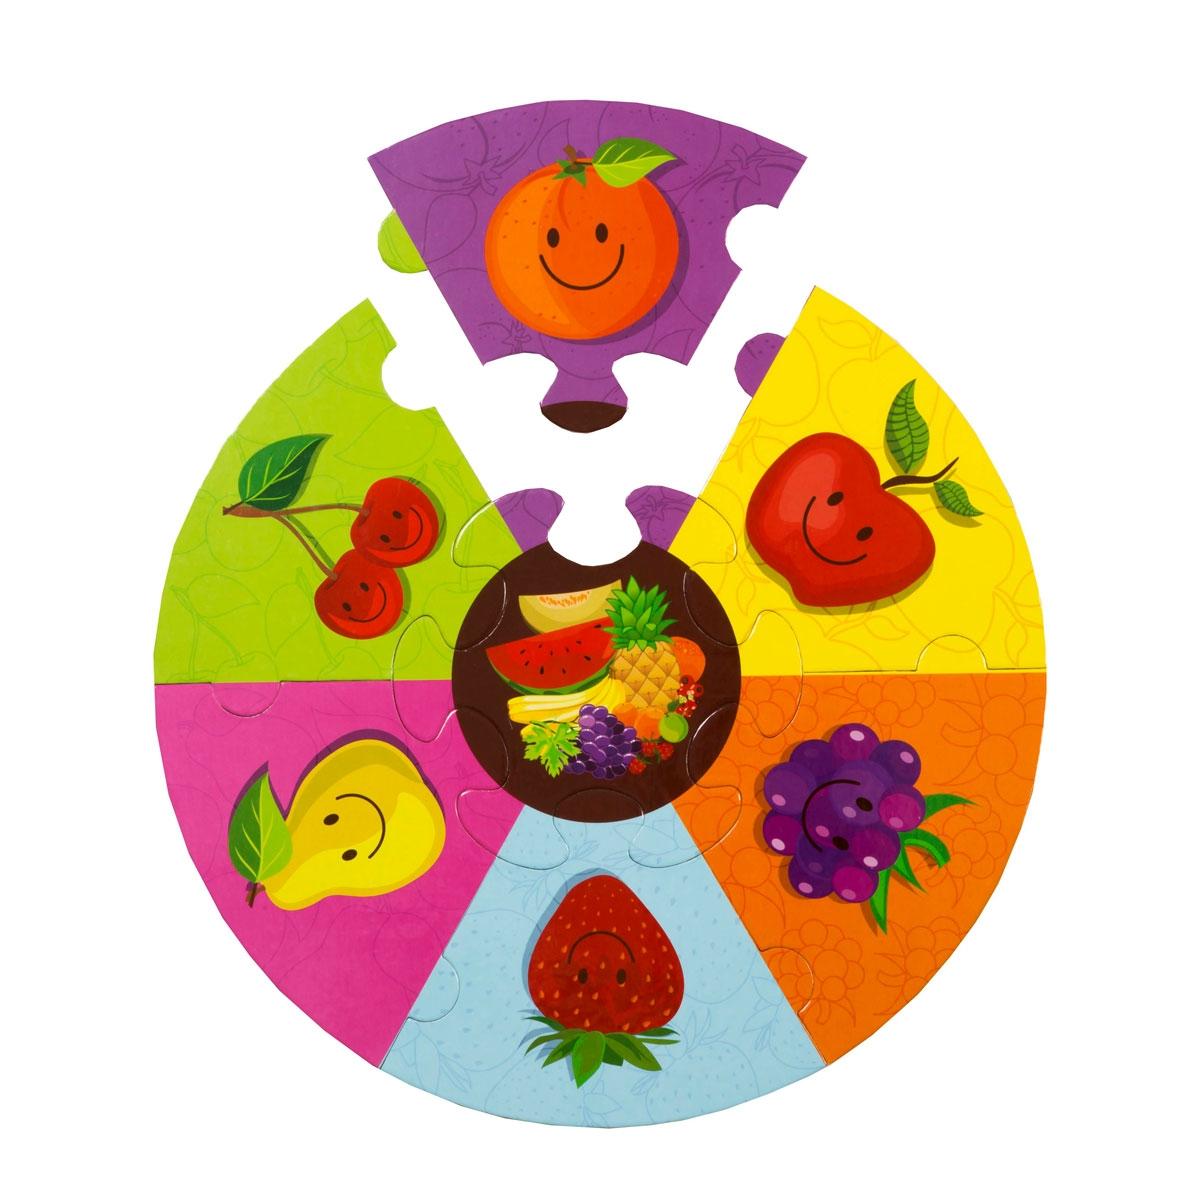 Yuvarlak Puzzle - Meyveler